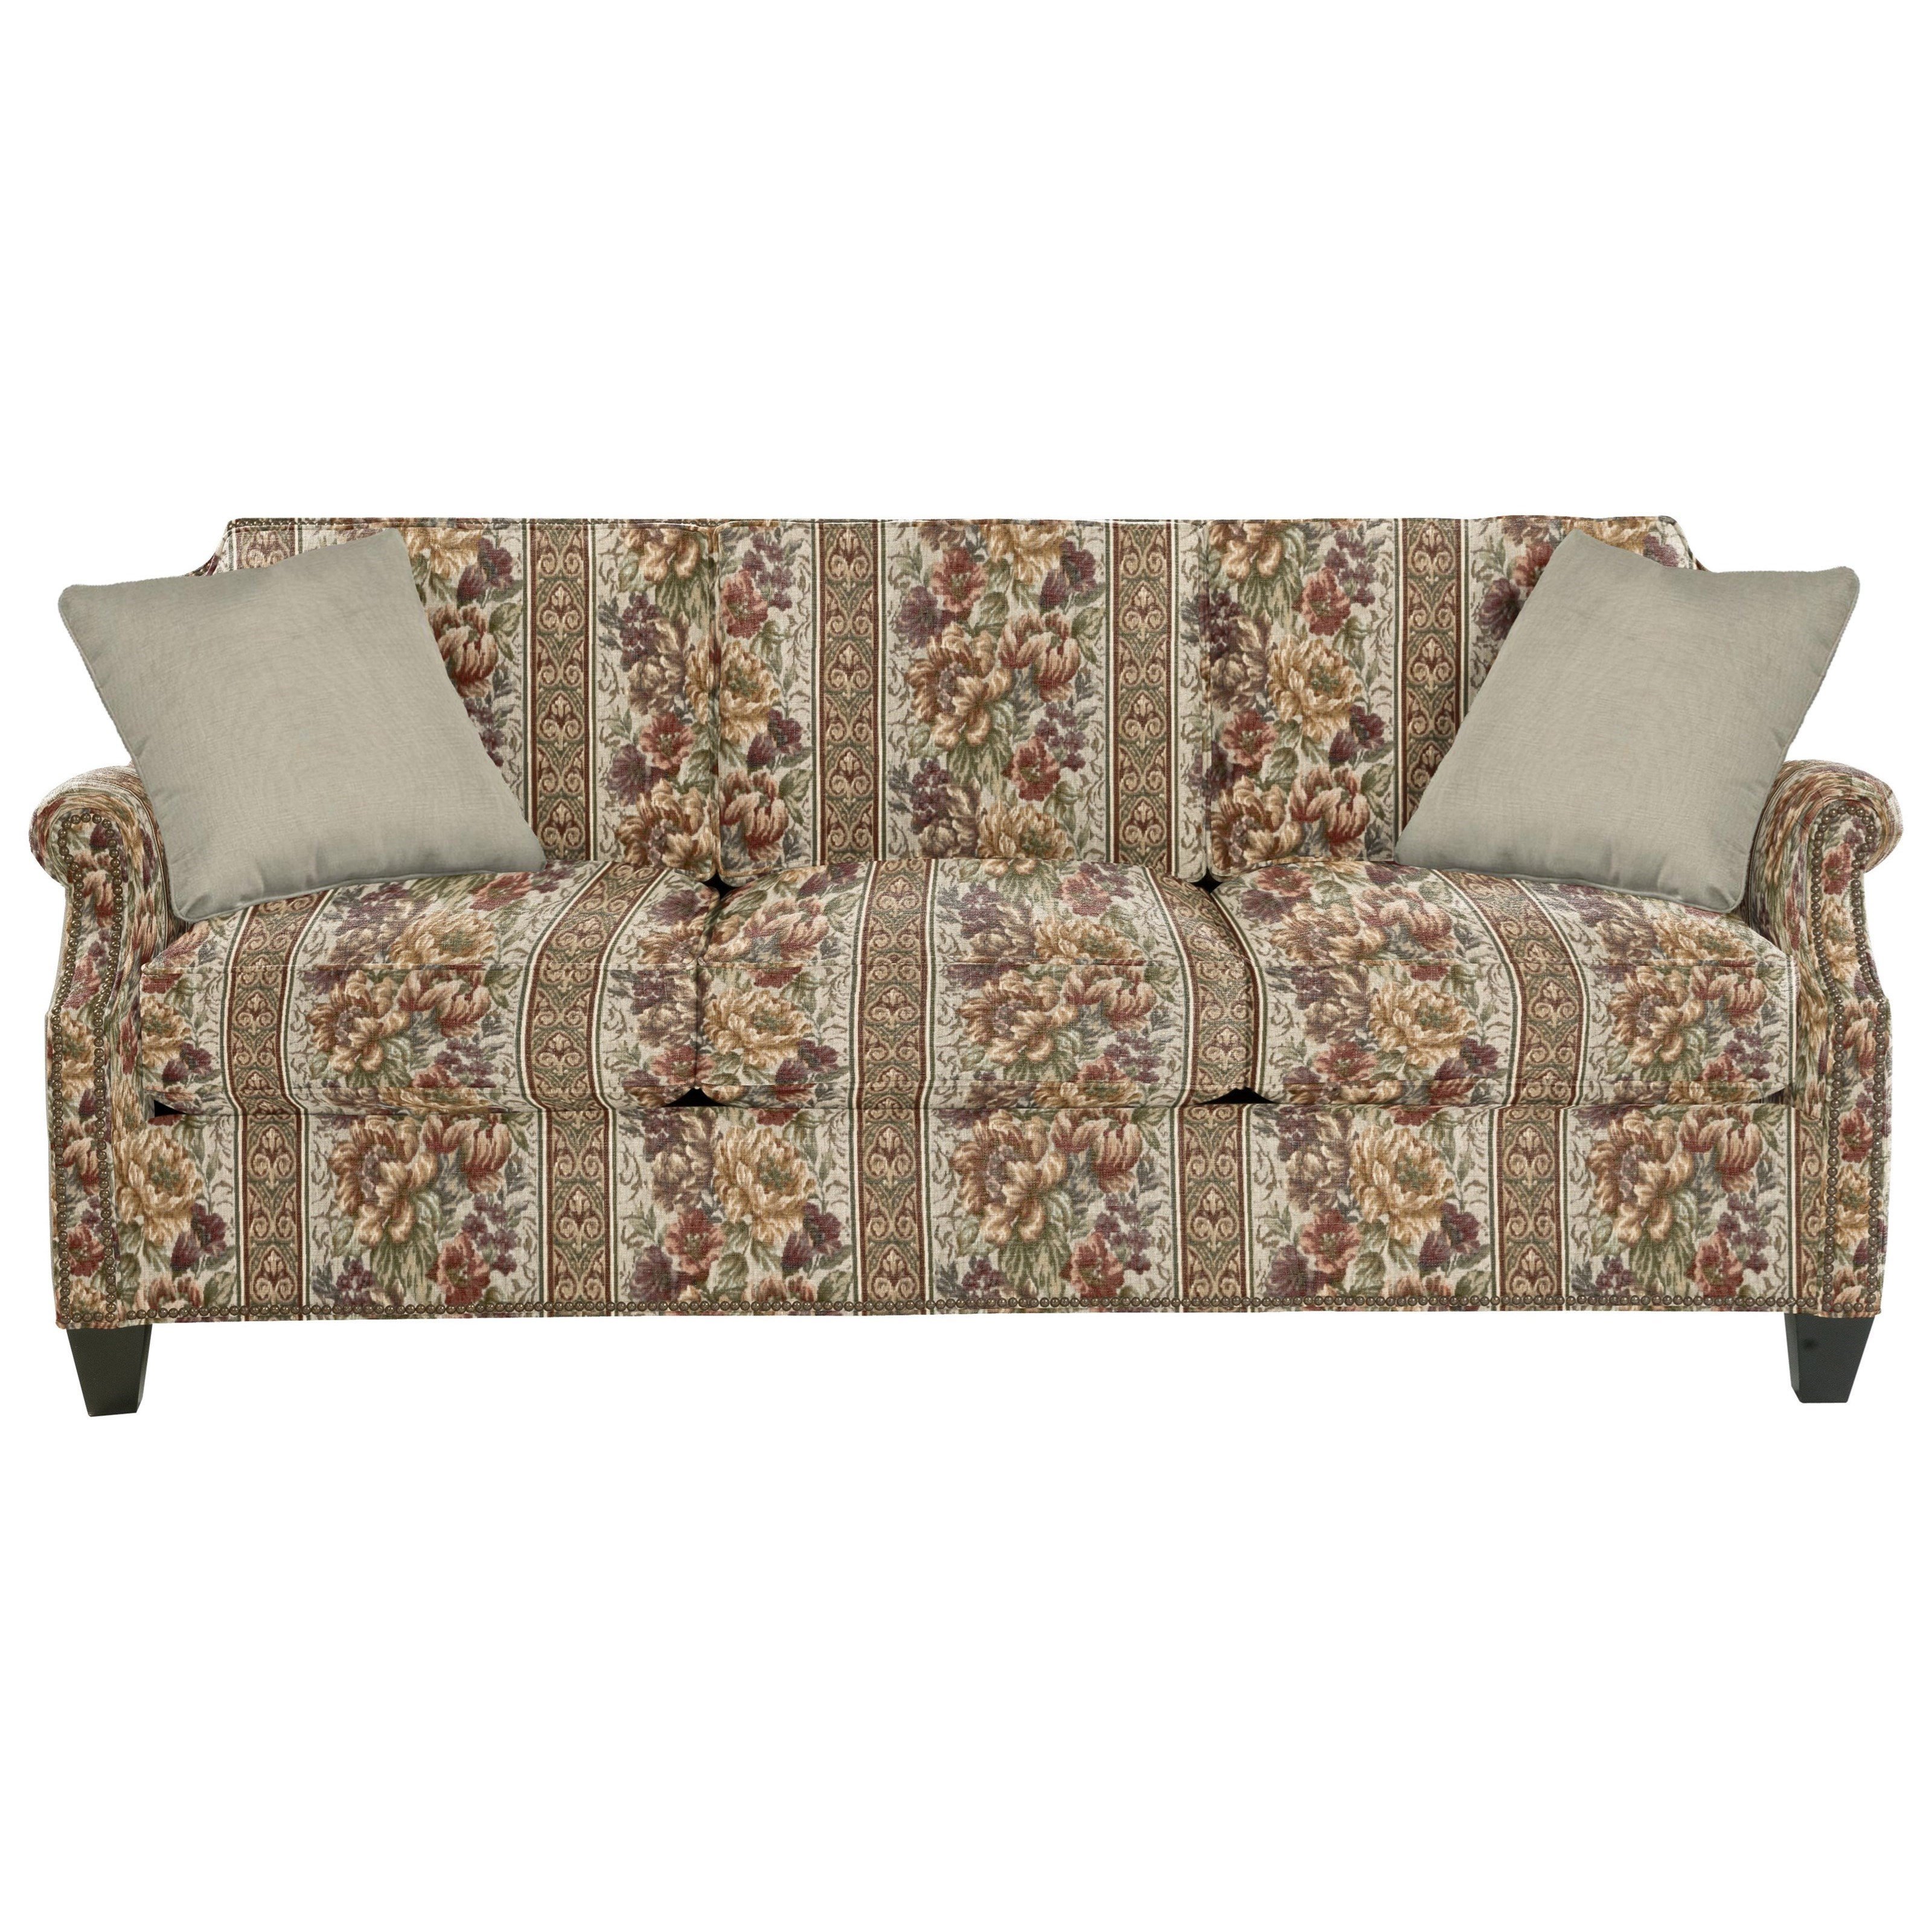 9383 Sofa by Craftmaster at Turk Furniture